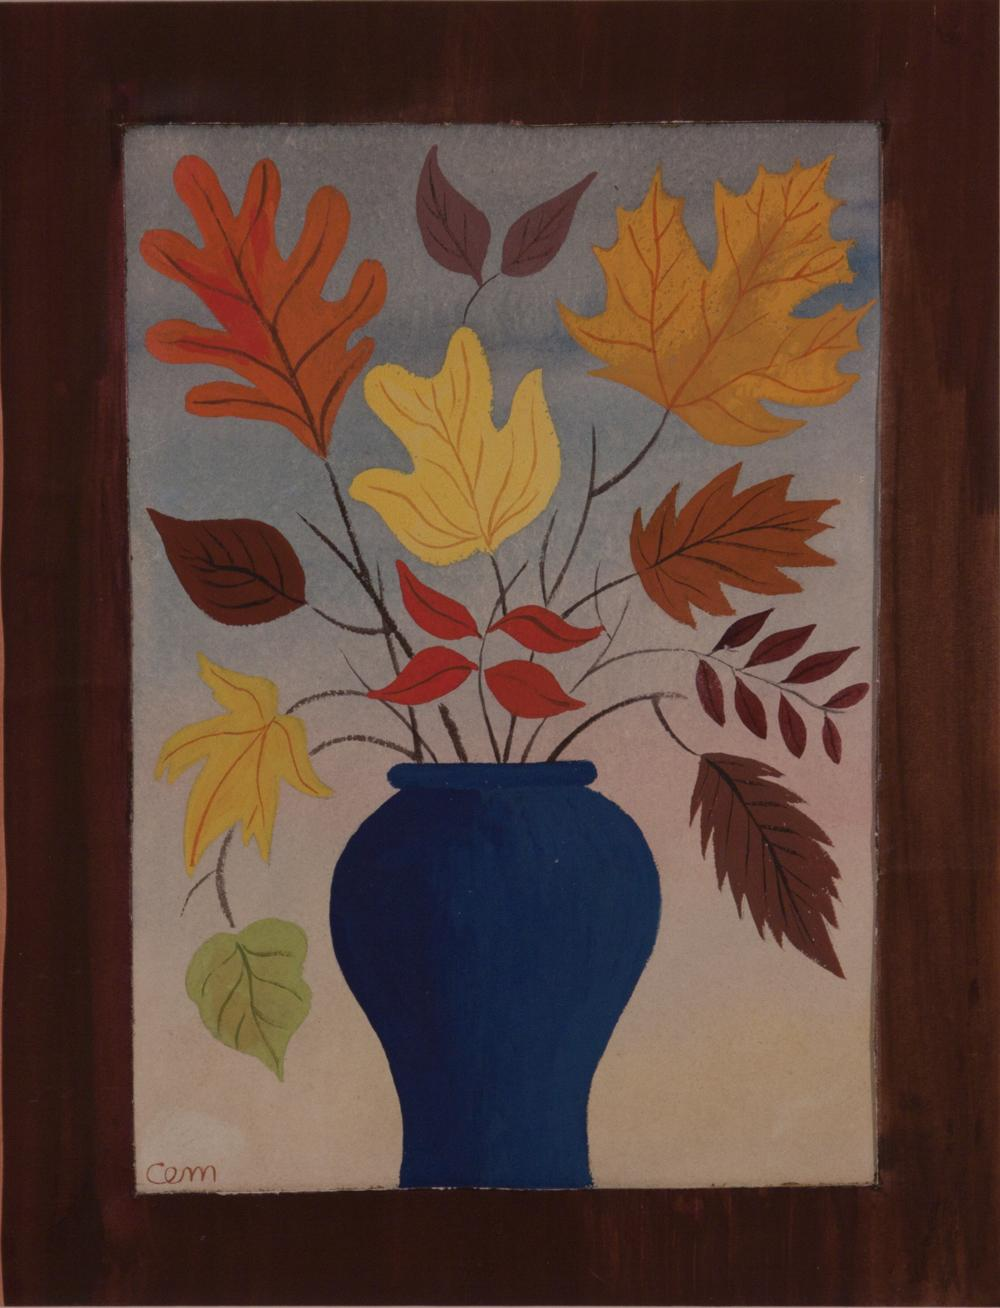 Charles E. Martin Autumn Leaves 2